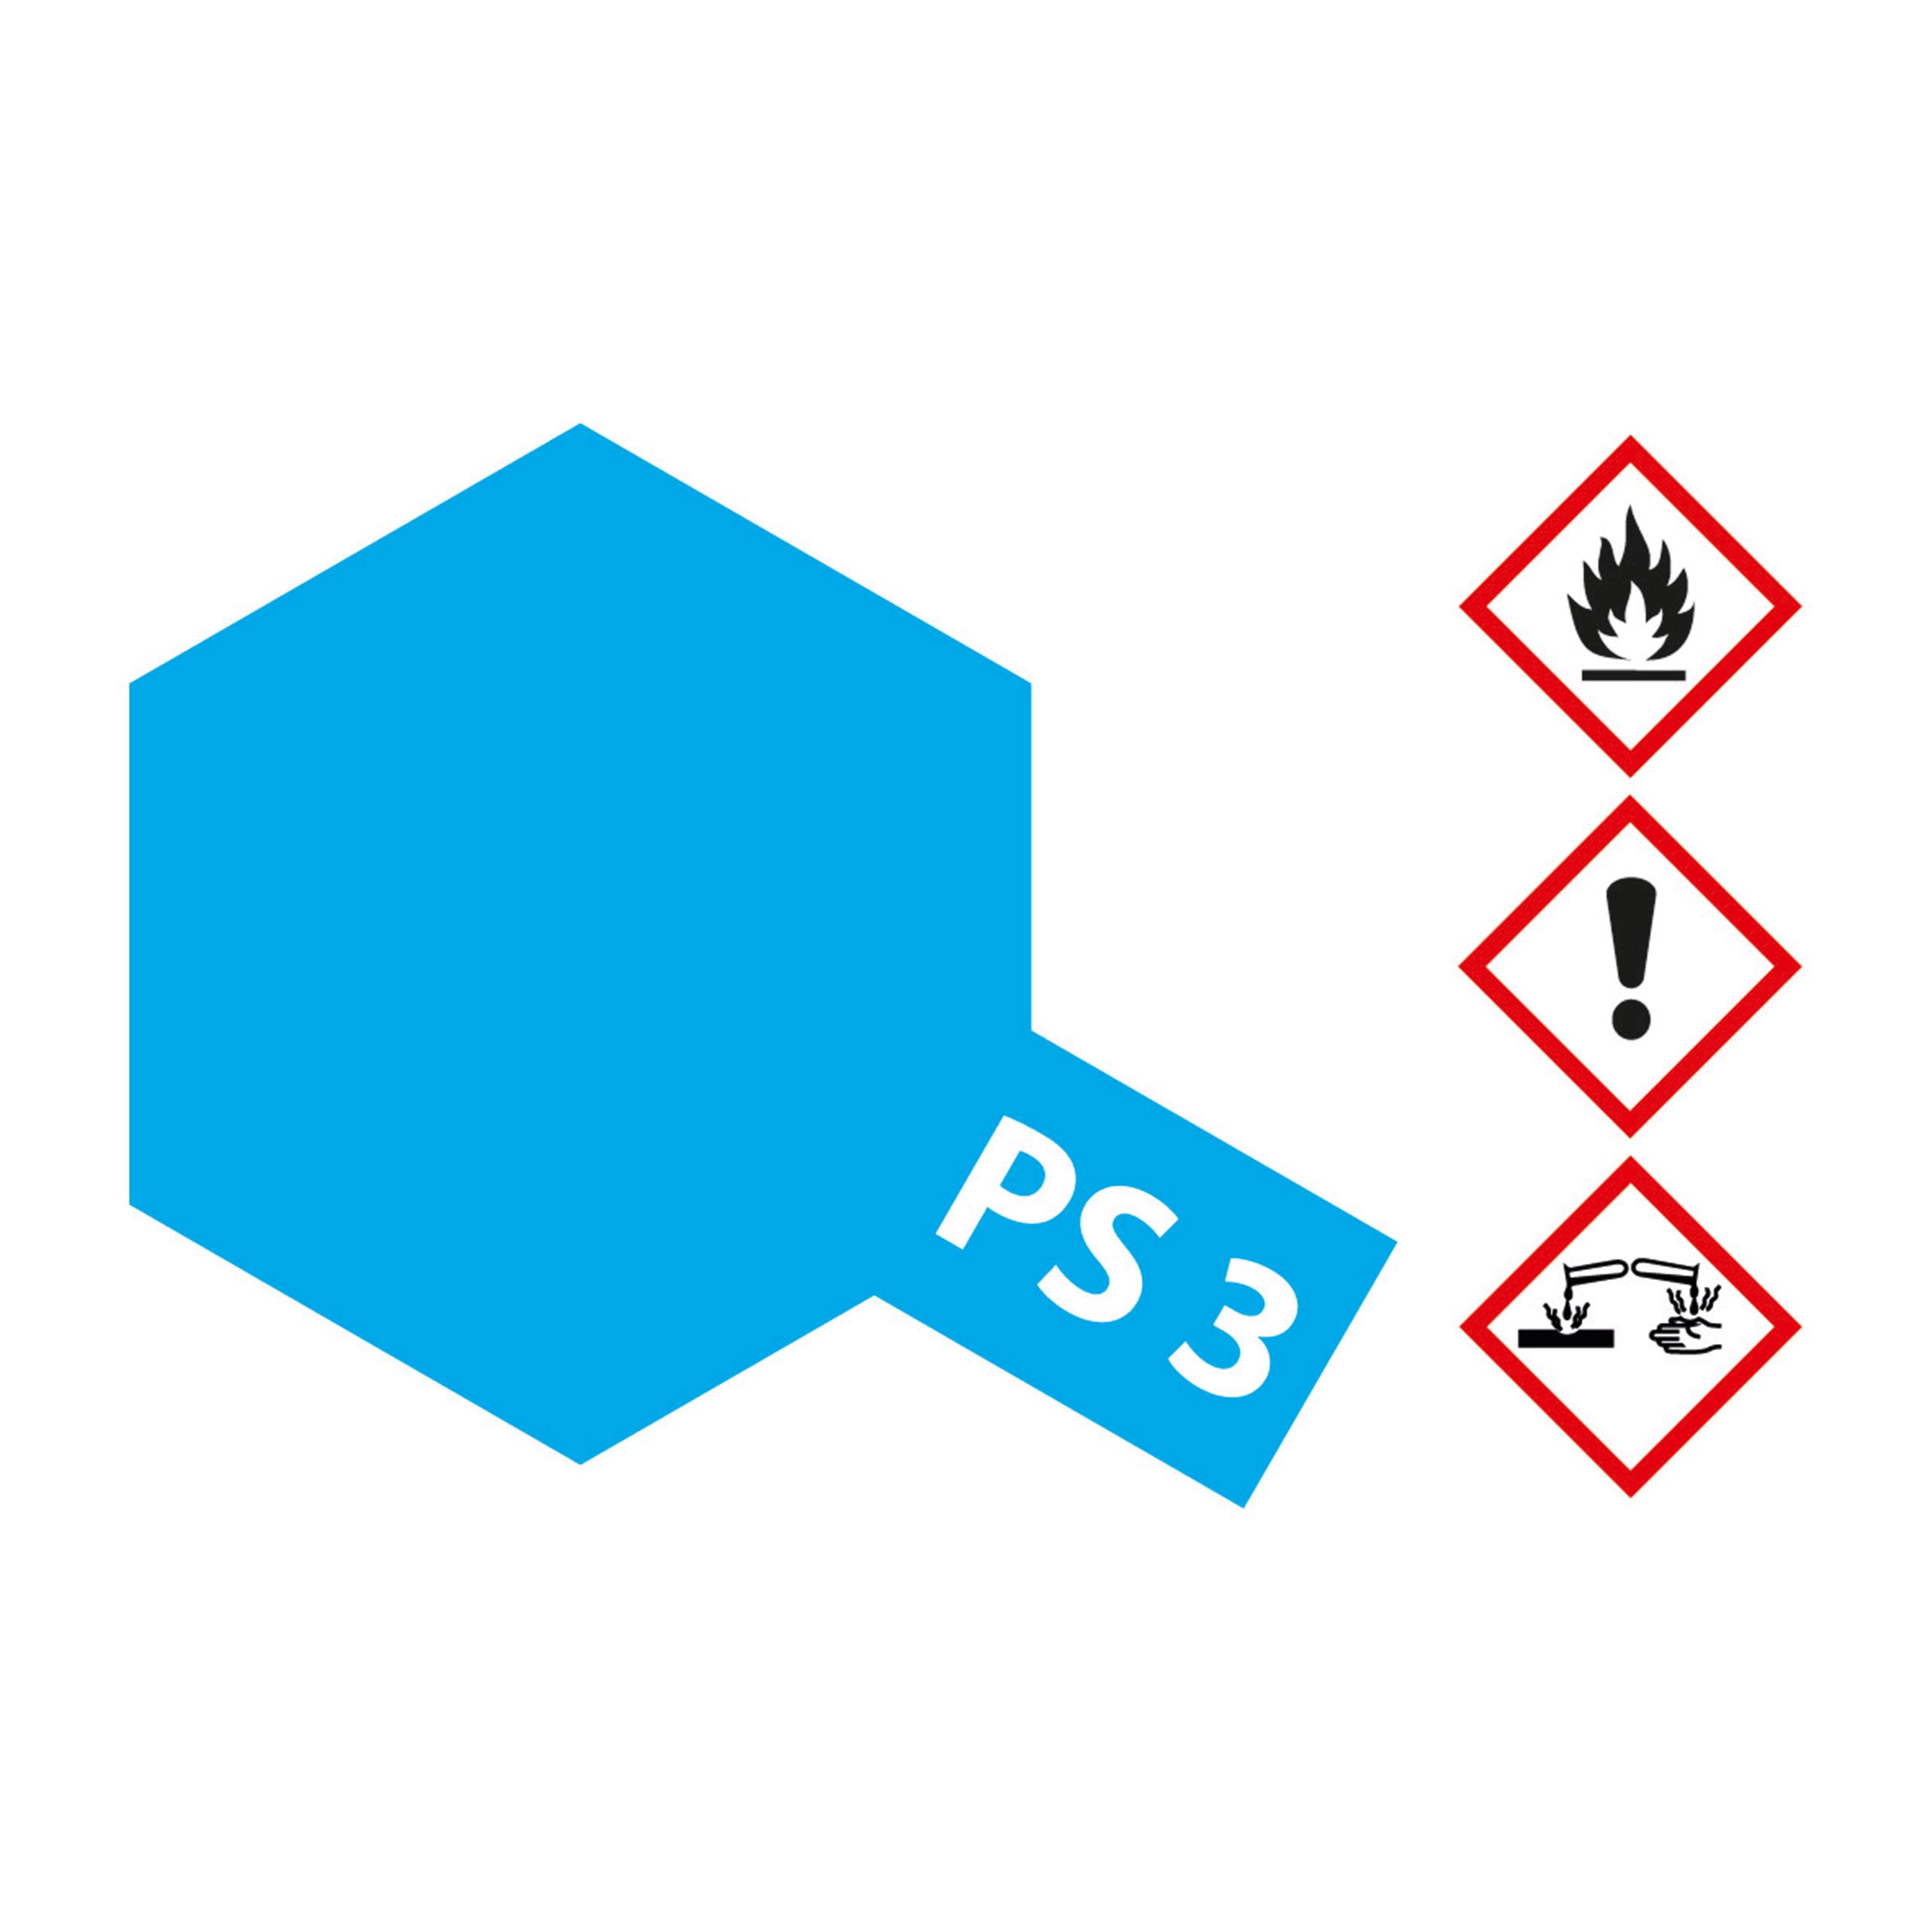 PS-3 Hellblau Polycarbonat - 100ml Sprayfarbe Lexan - Tamiya 300086003